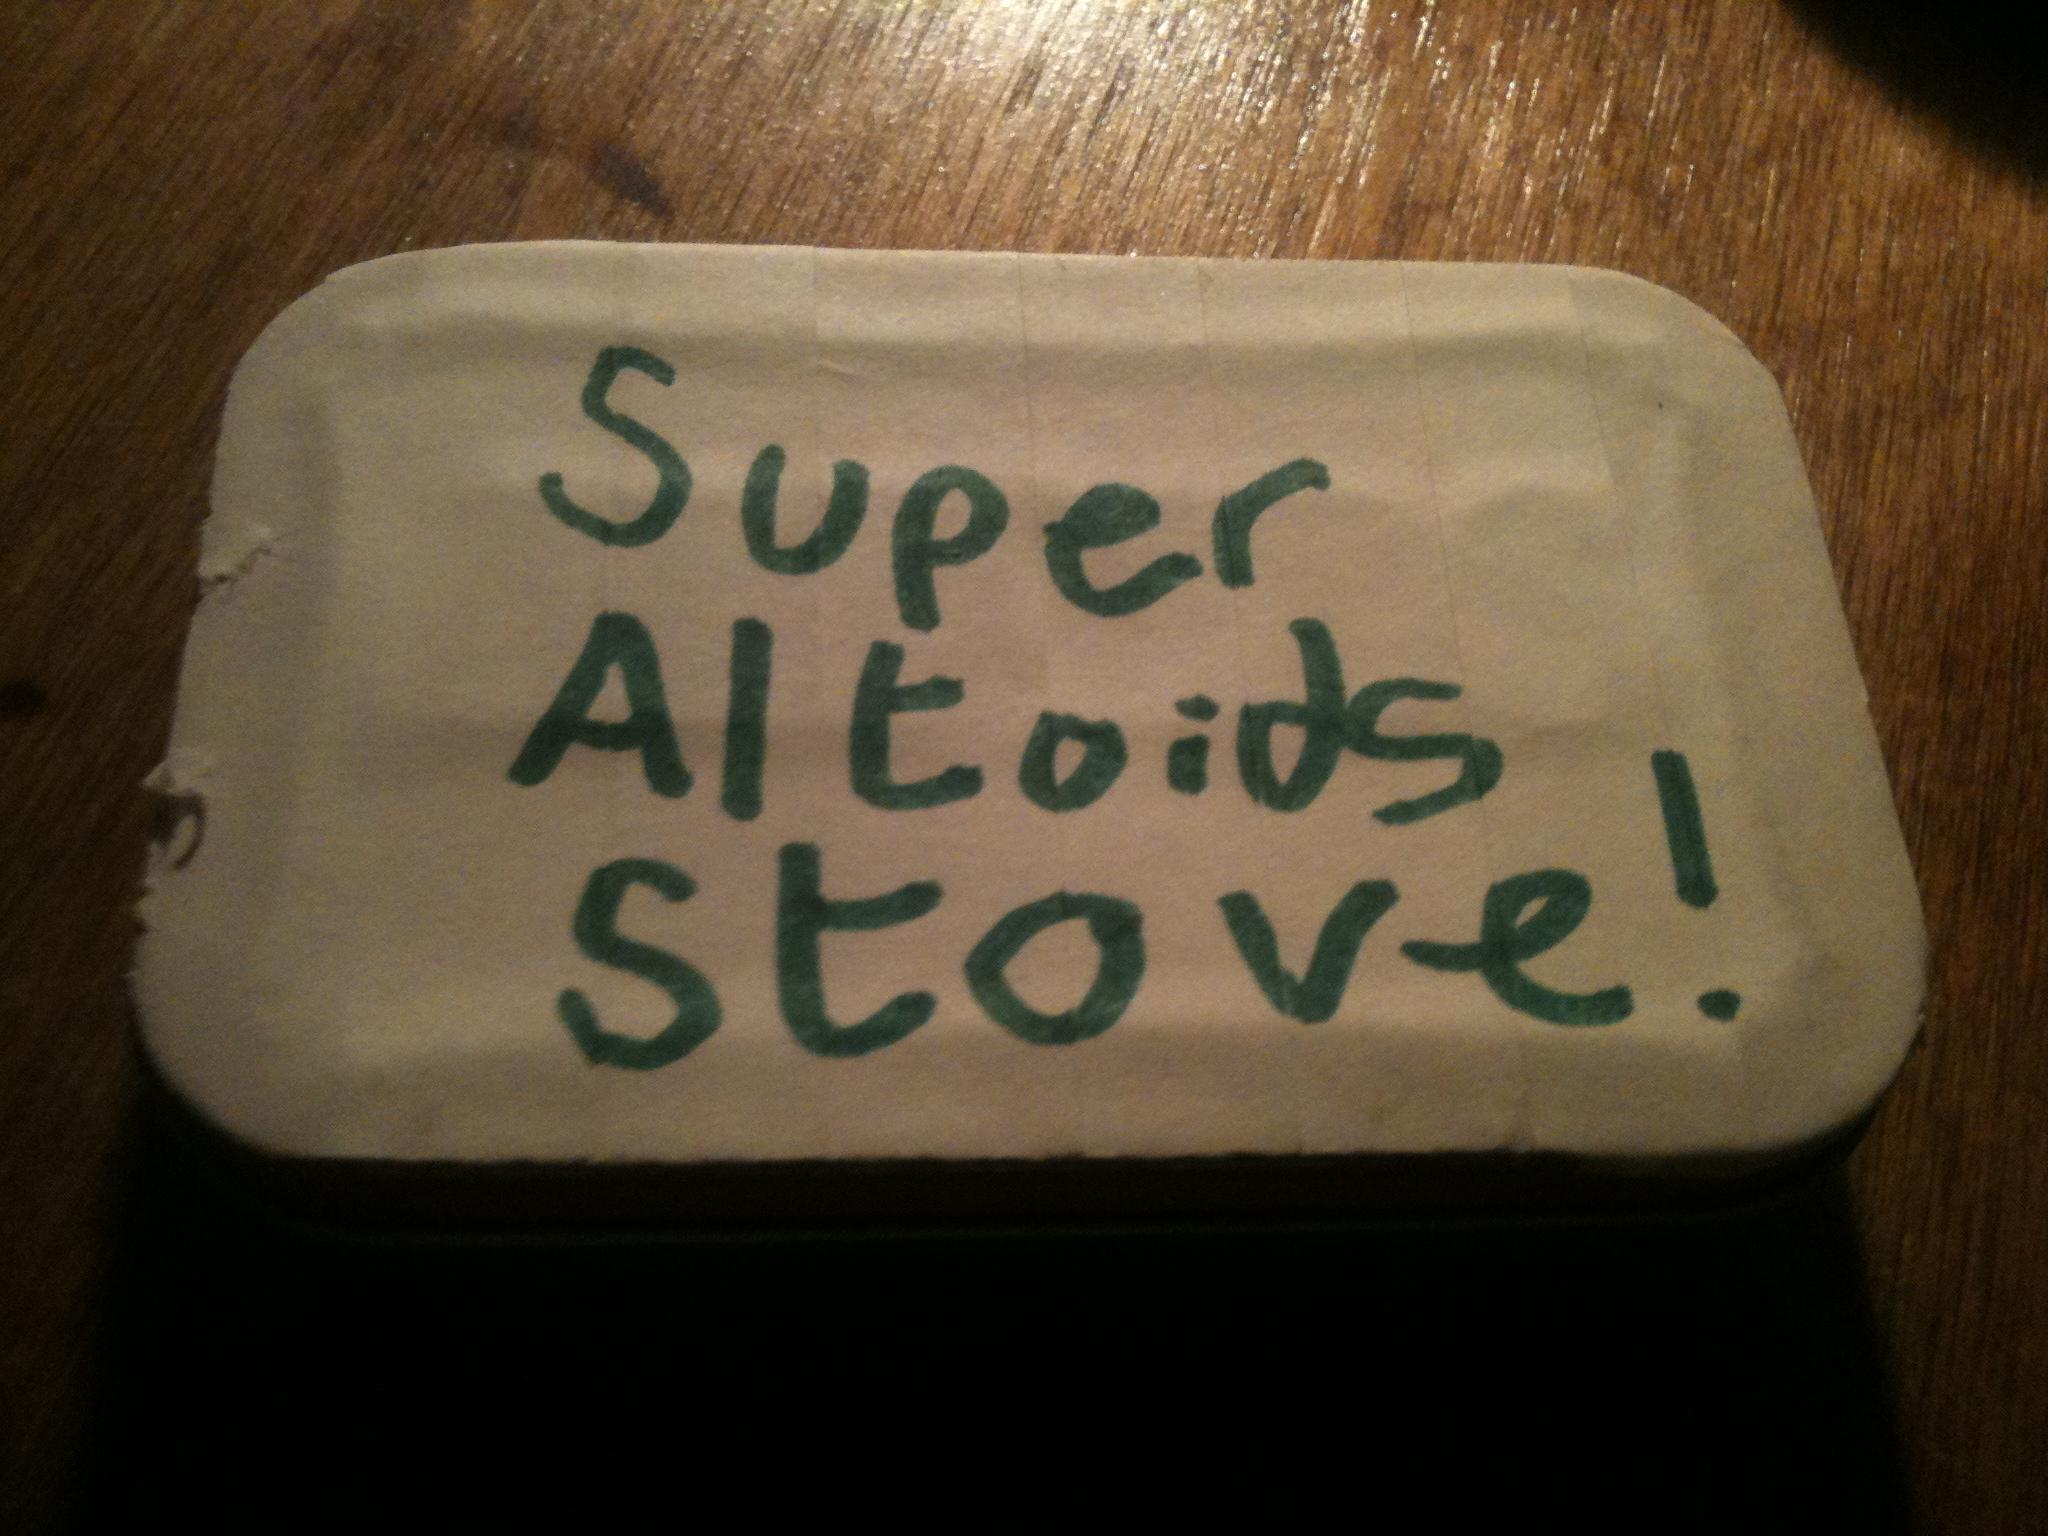 Super Altoids stove